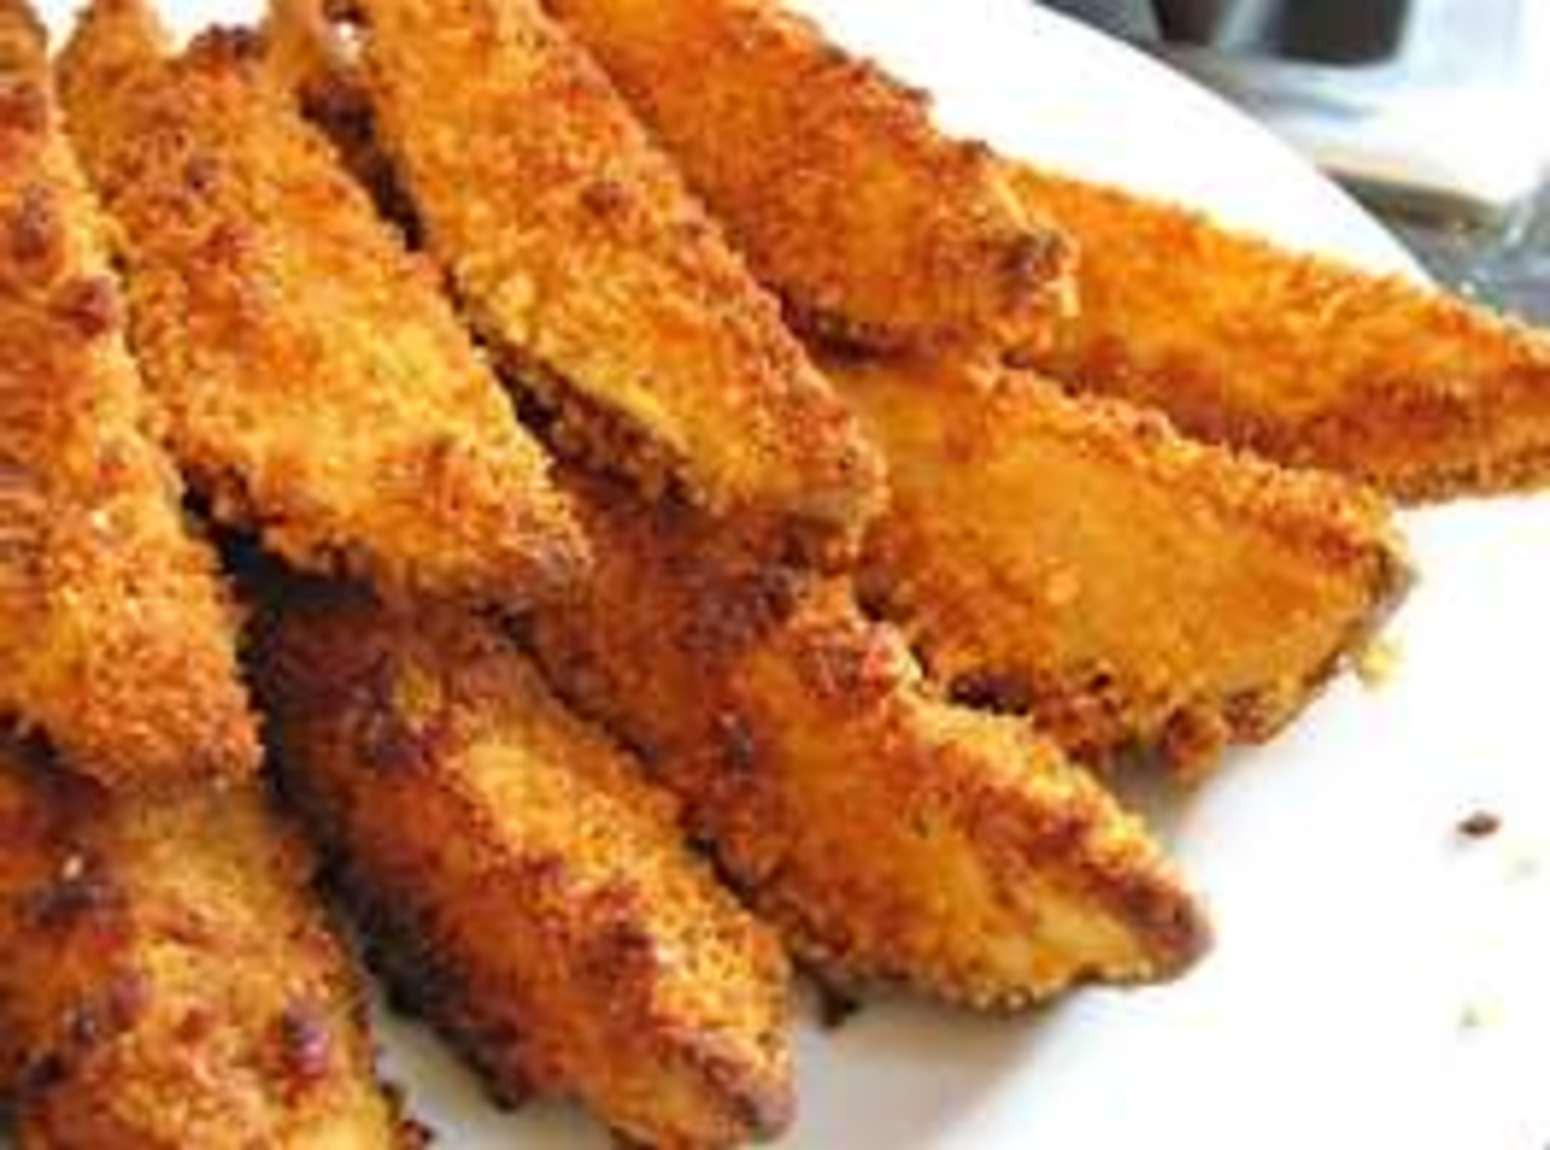 Potato Wedge Recipes  Oven Fried Potato Wedges Recipe